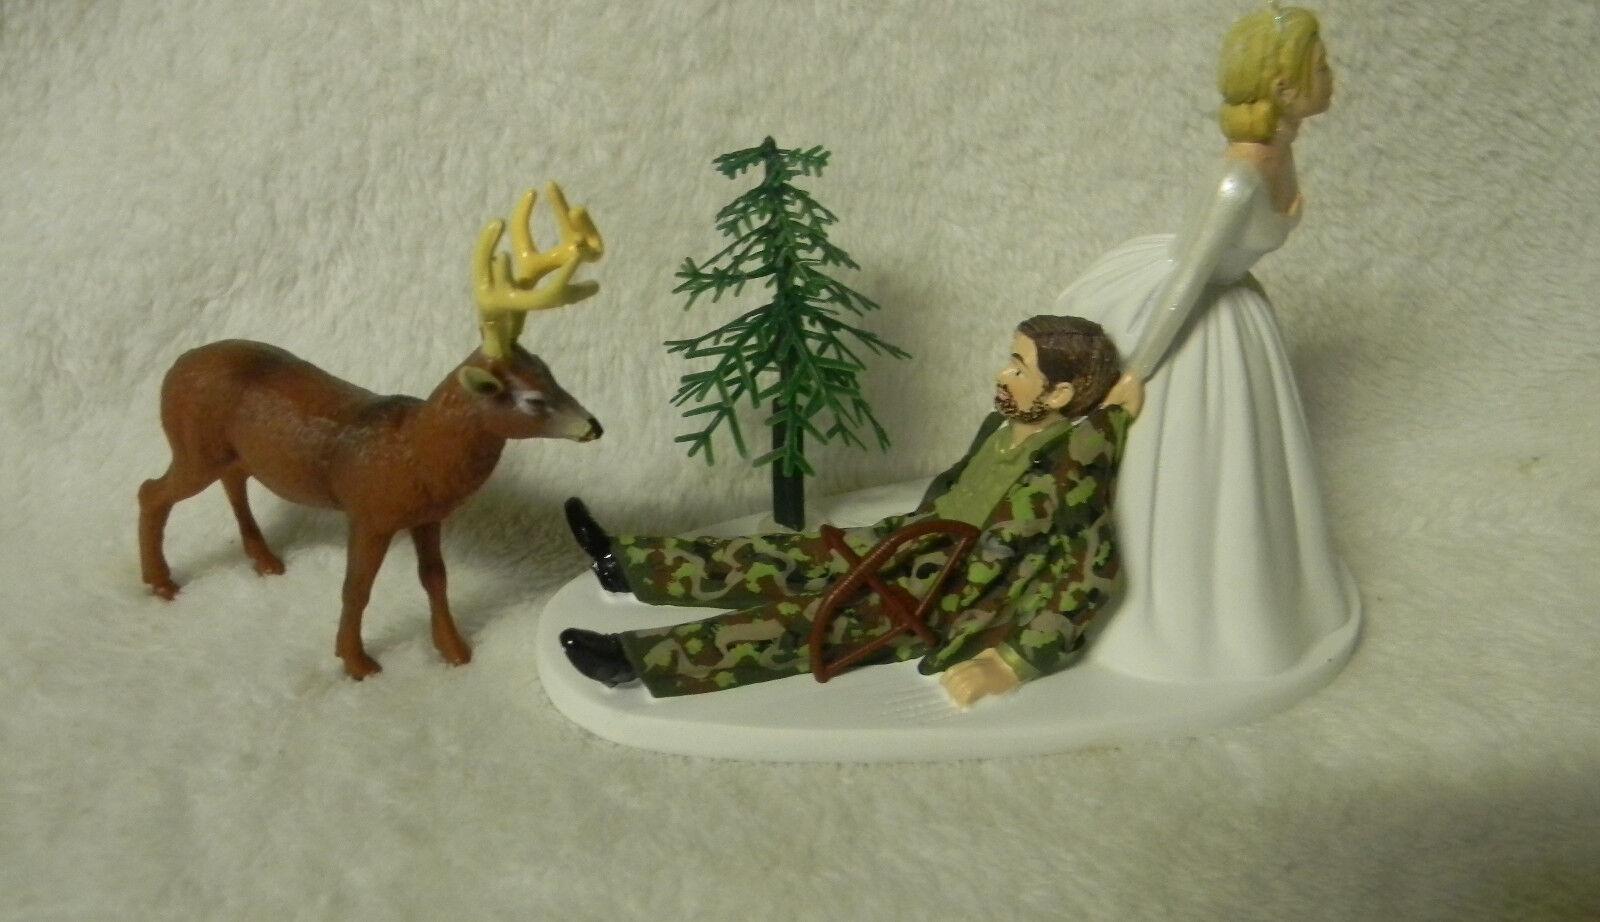 Mariage Camo plouc du Deer Hunting Bow Hunter marié avec barbe cake topper